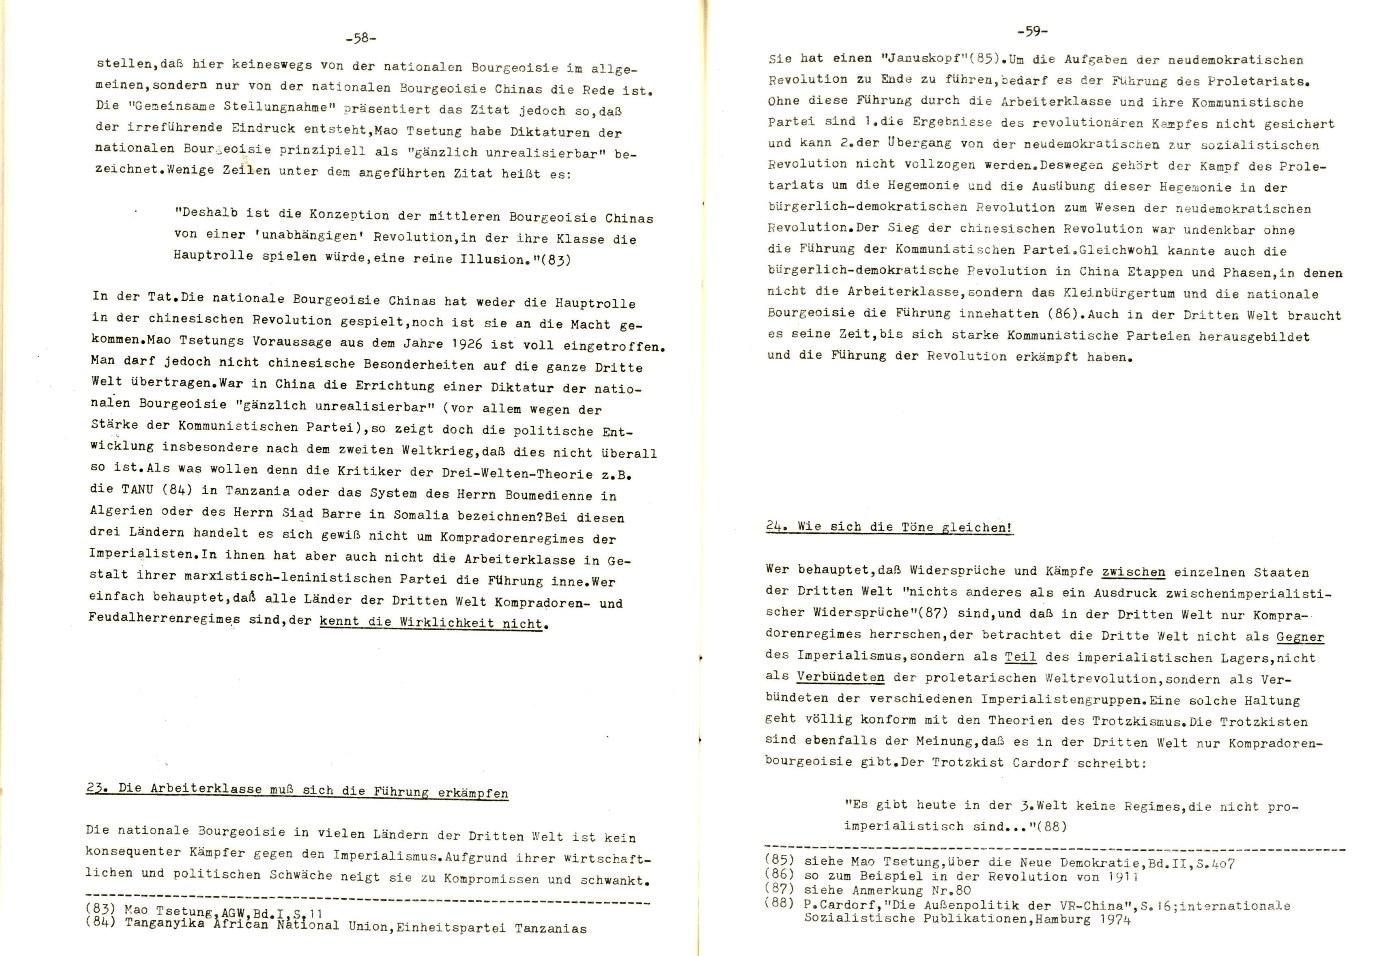 Muenchen_Kampf_dem_Revisionismus_1978_04_05_31